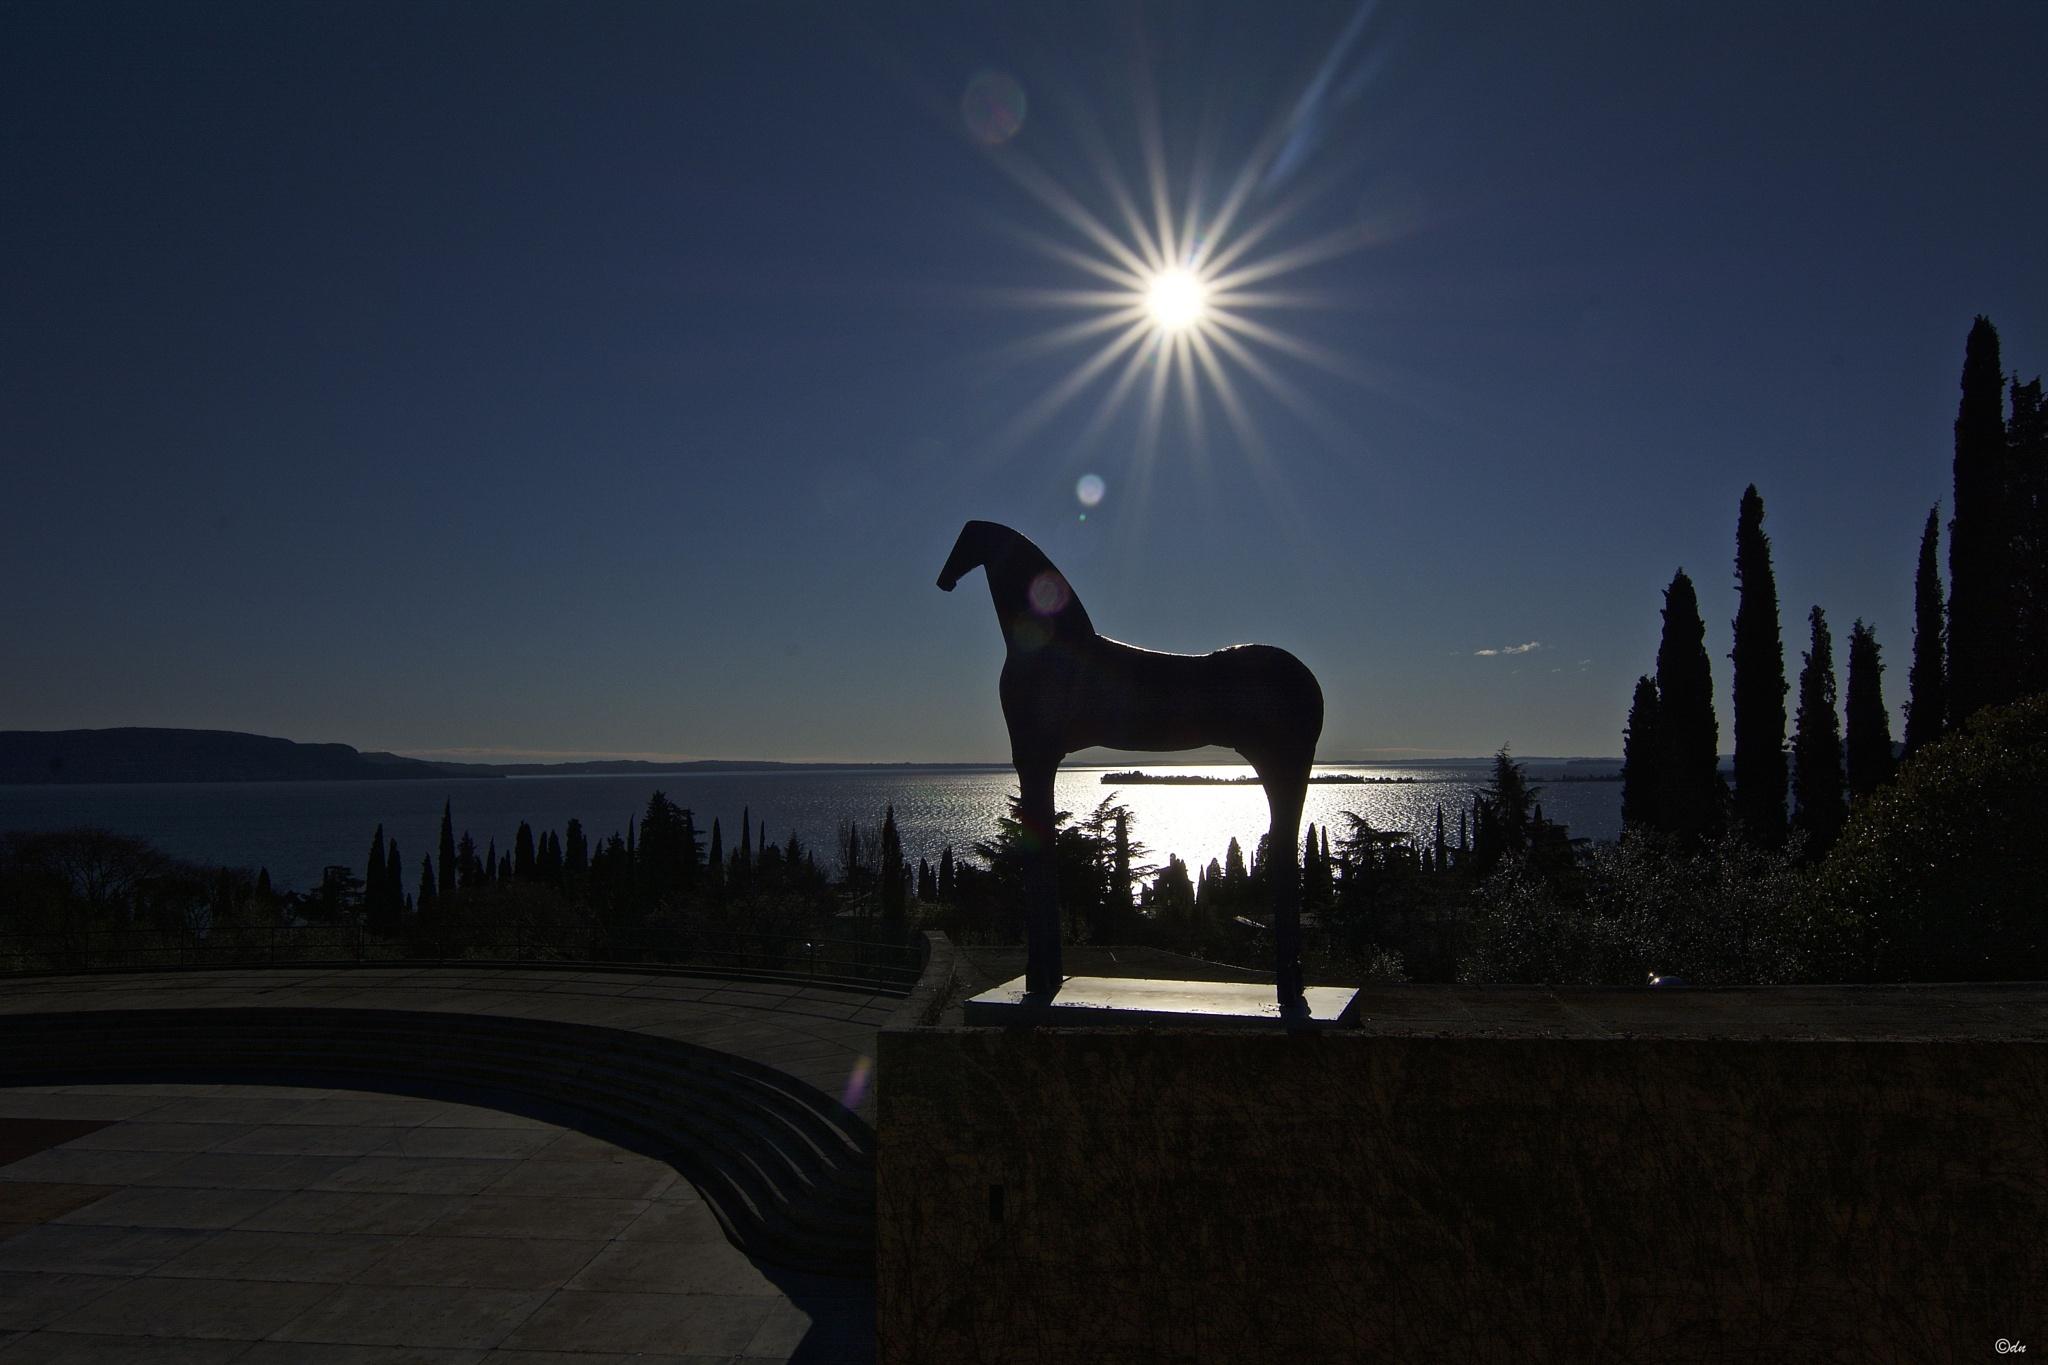 cavallo by DavideNegro